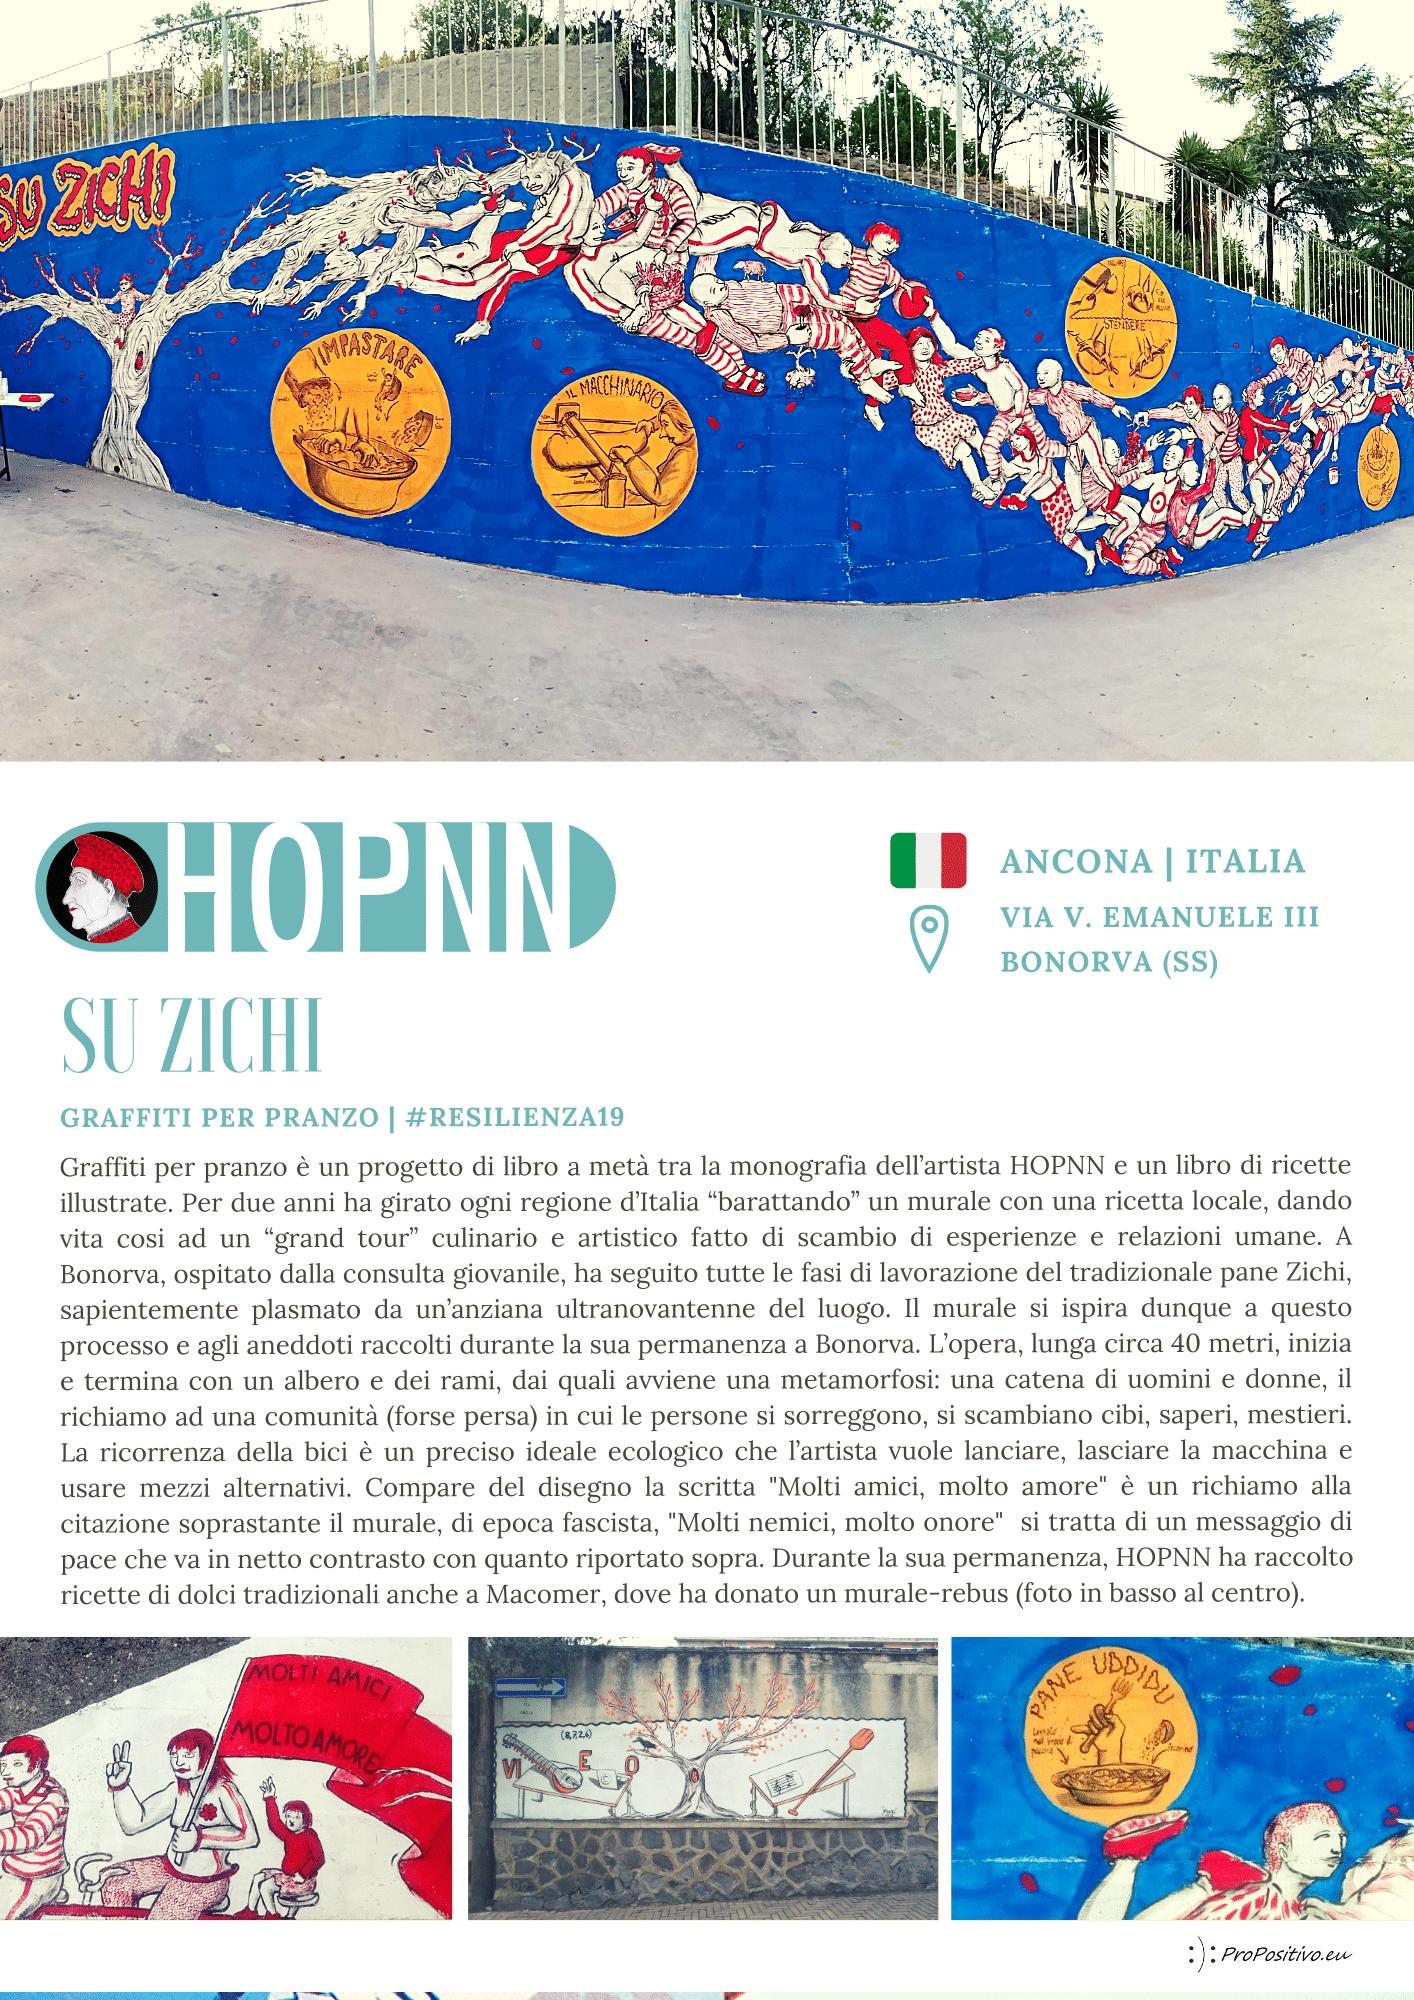 yuri romagnoli hoppn bonorva catalogo murales street art macomer sardegna festival resilienza propositivo 18